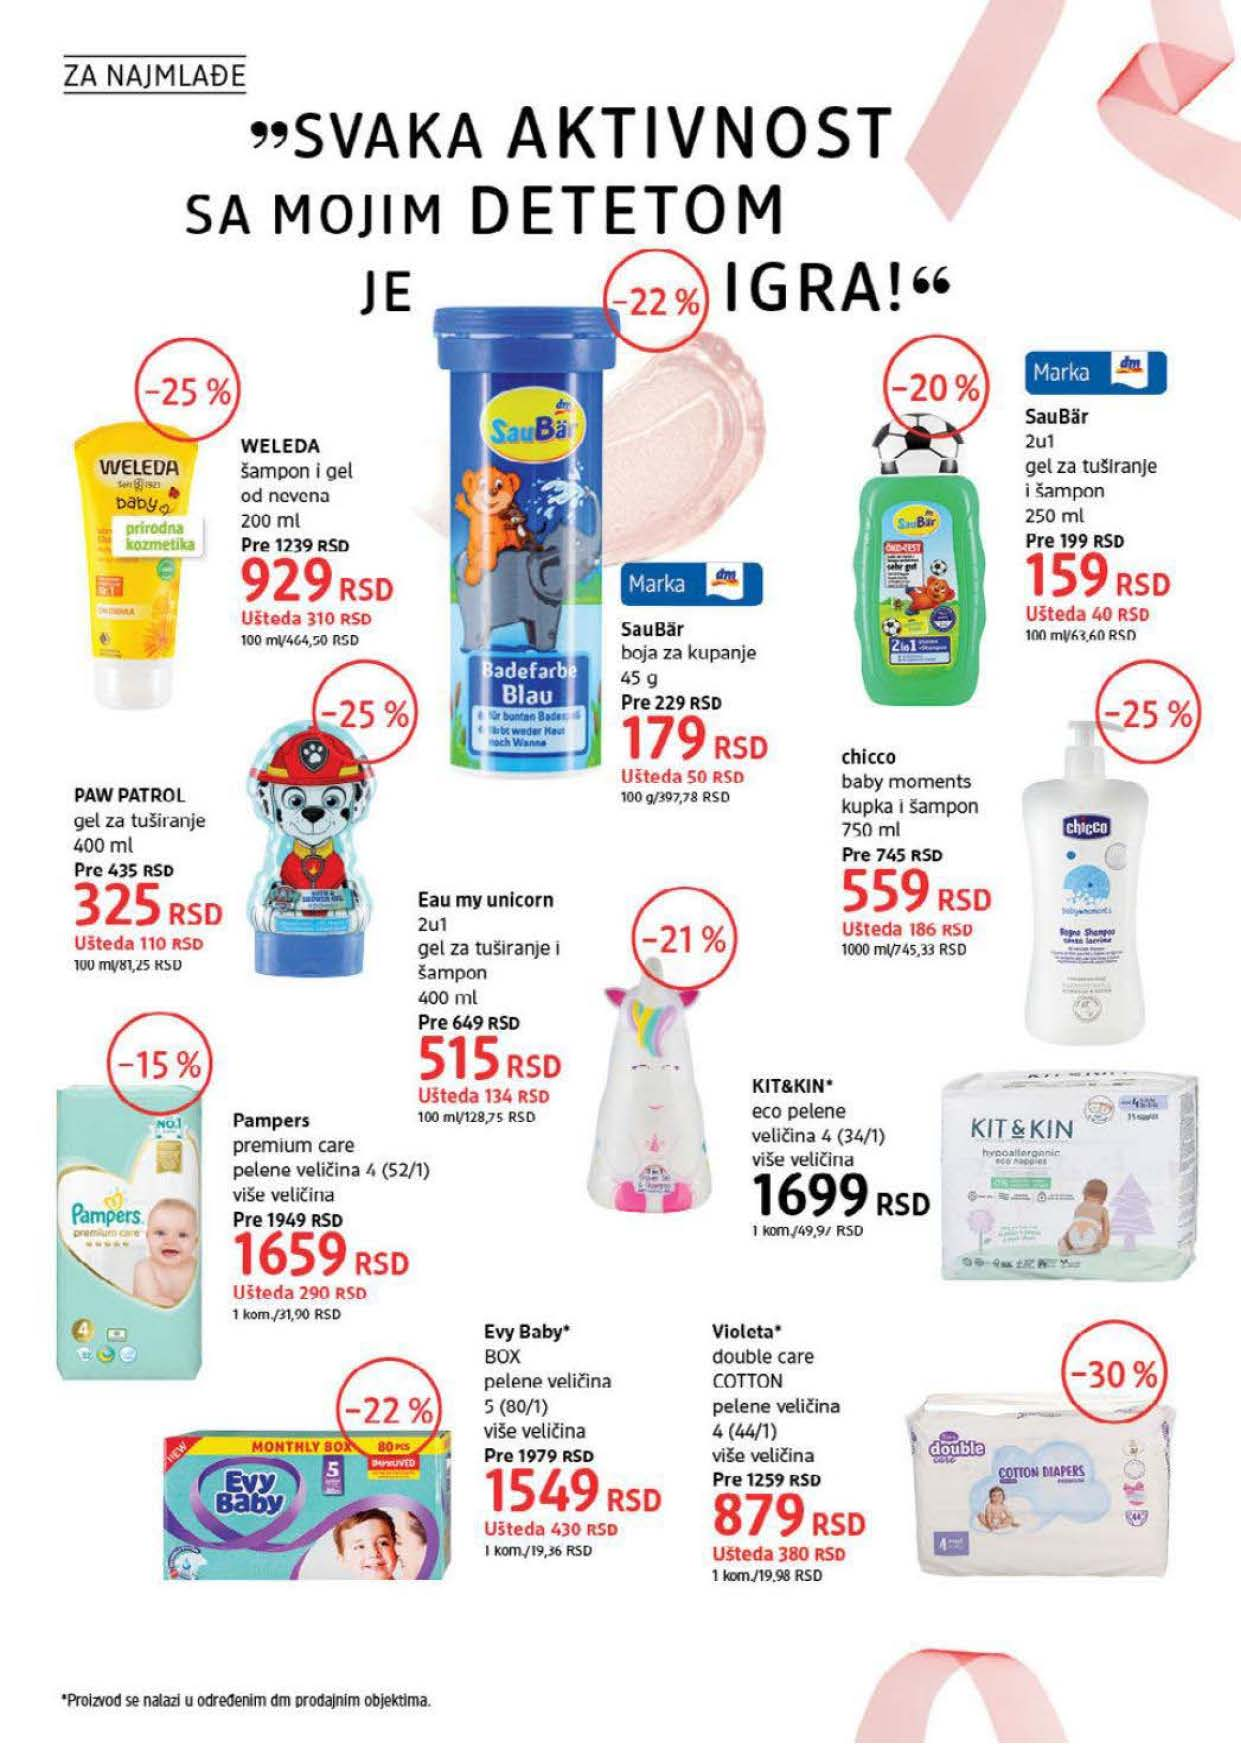 DM Katalog Srbija SEPTEMBAR 2021 1.9.2021. 30.9.2021. Page 28